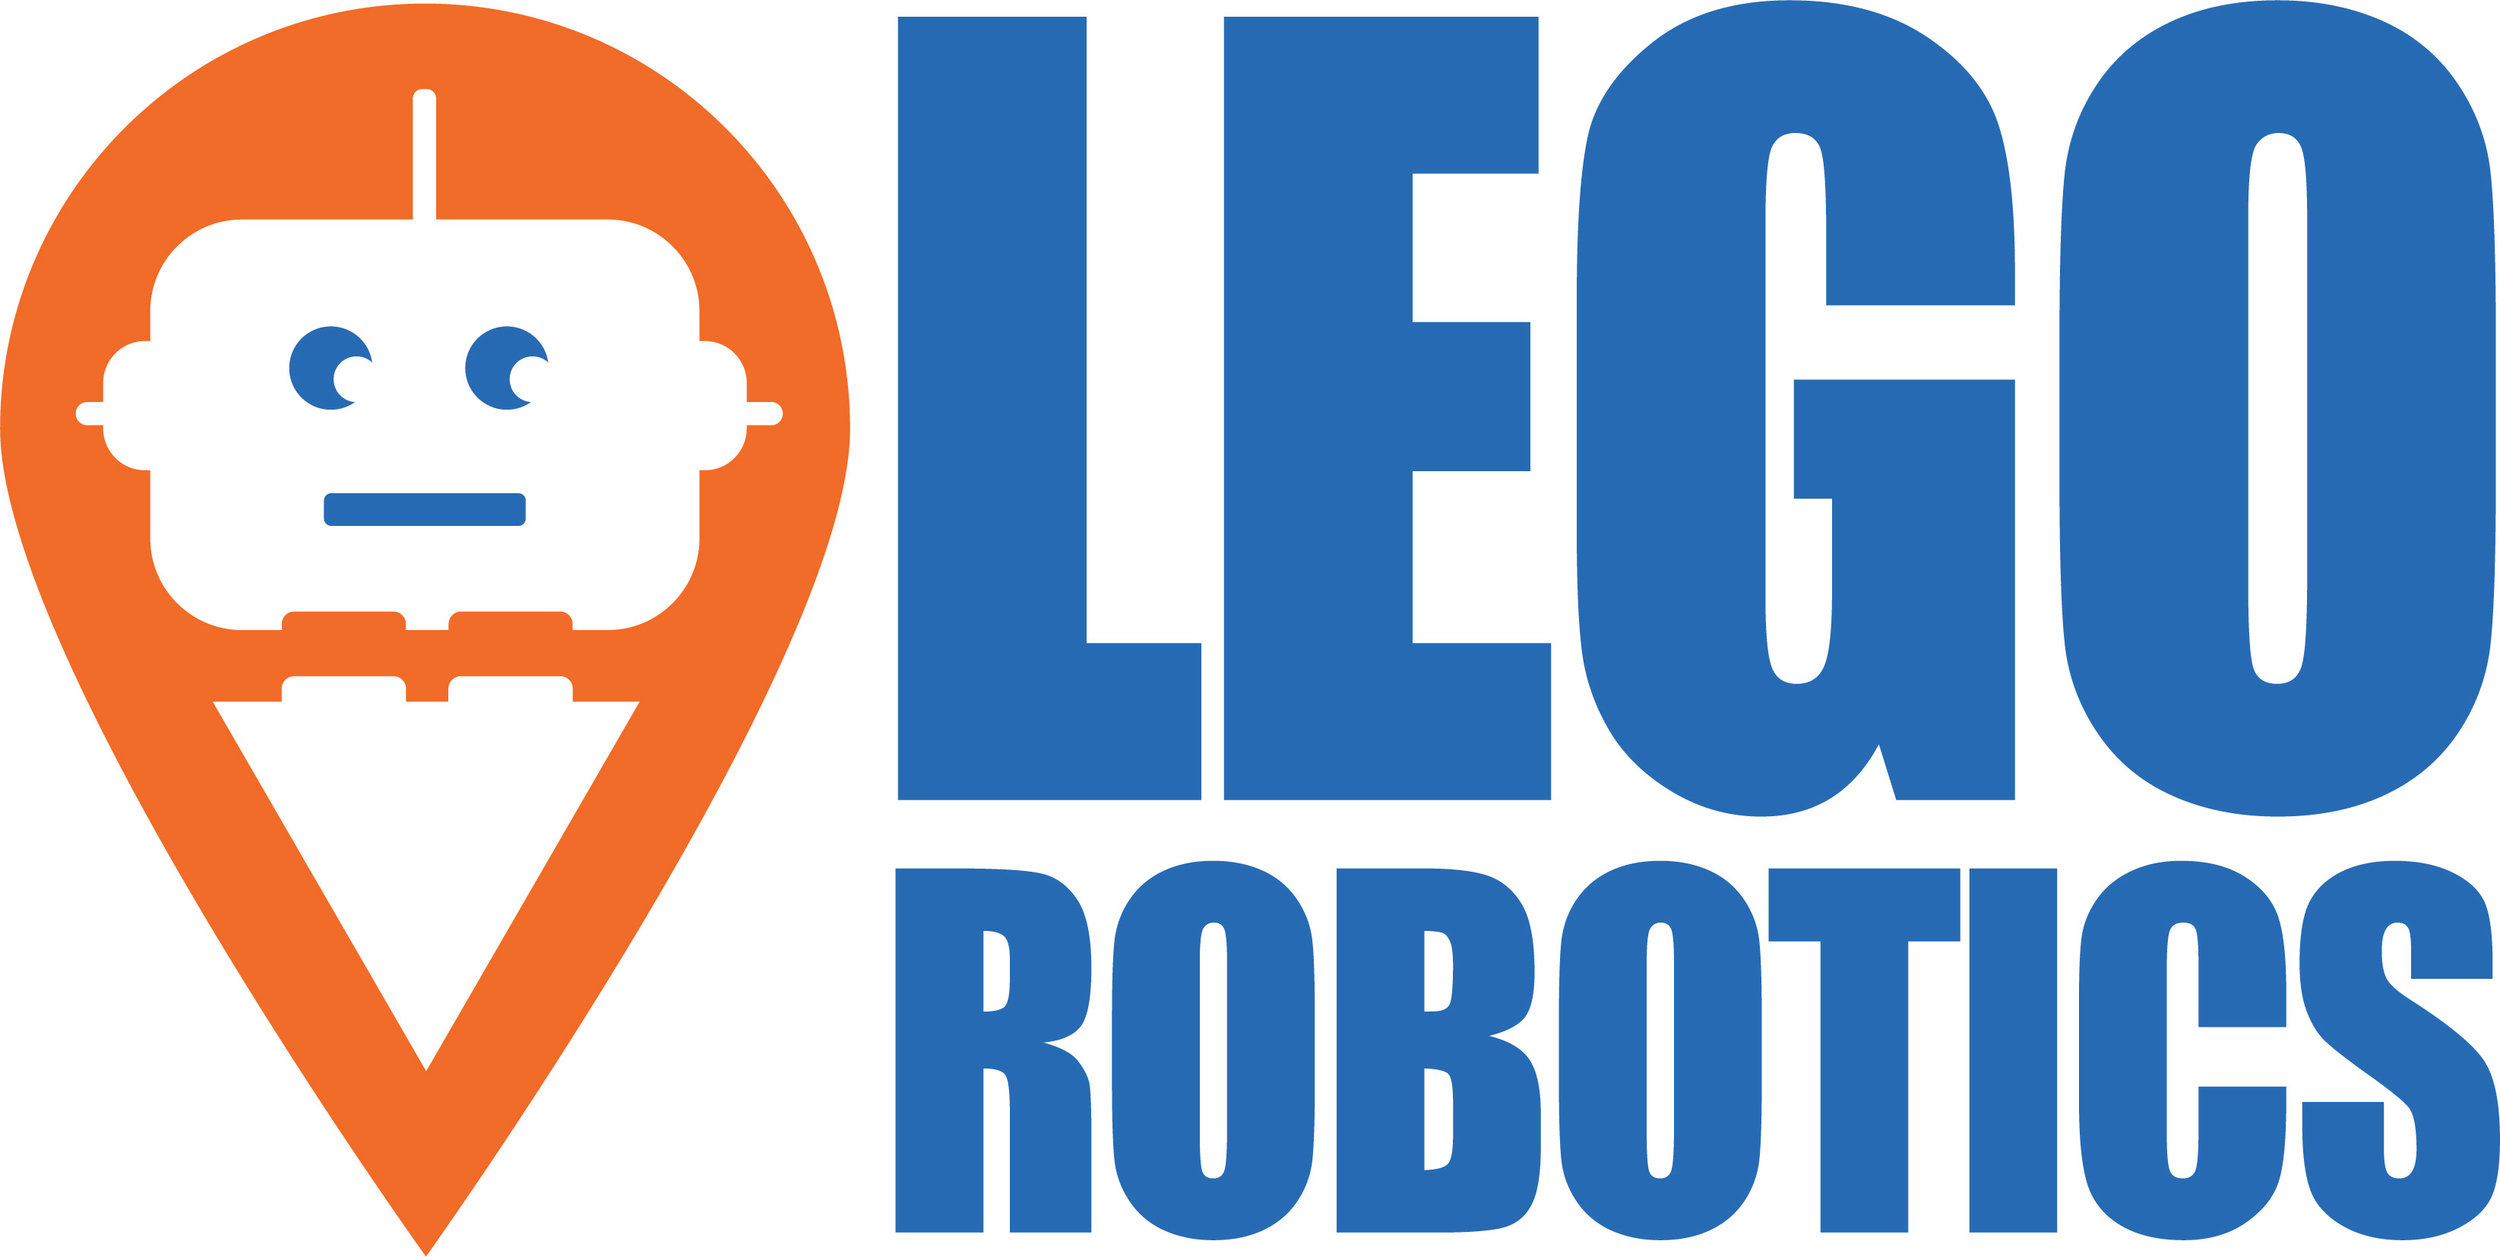 Lego Robotics Logo.jpg